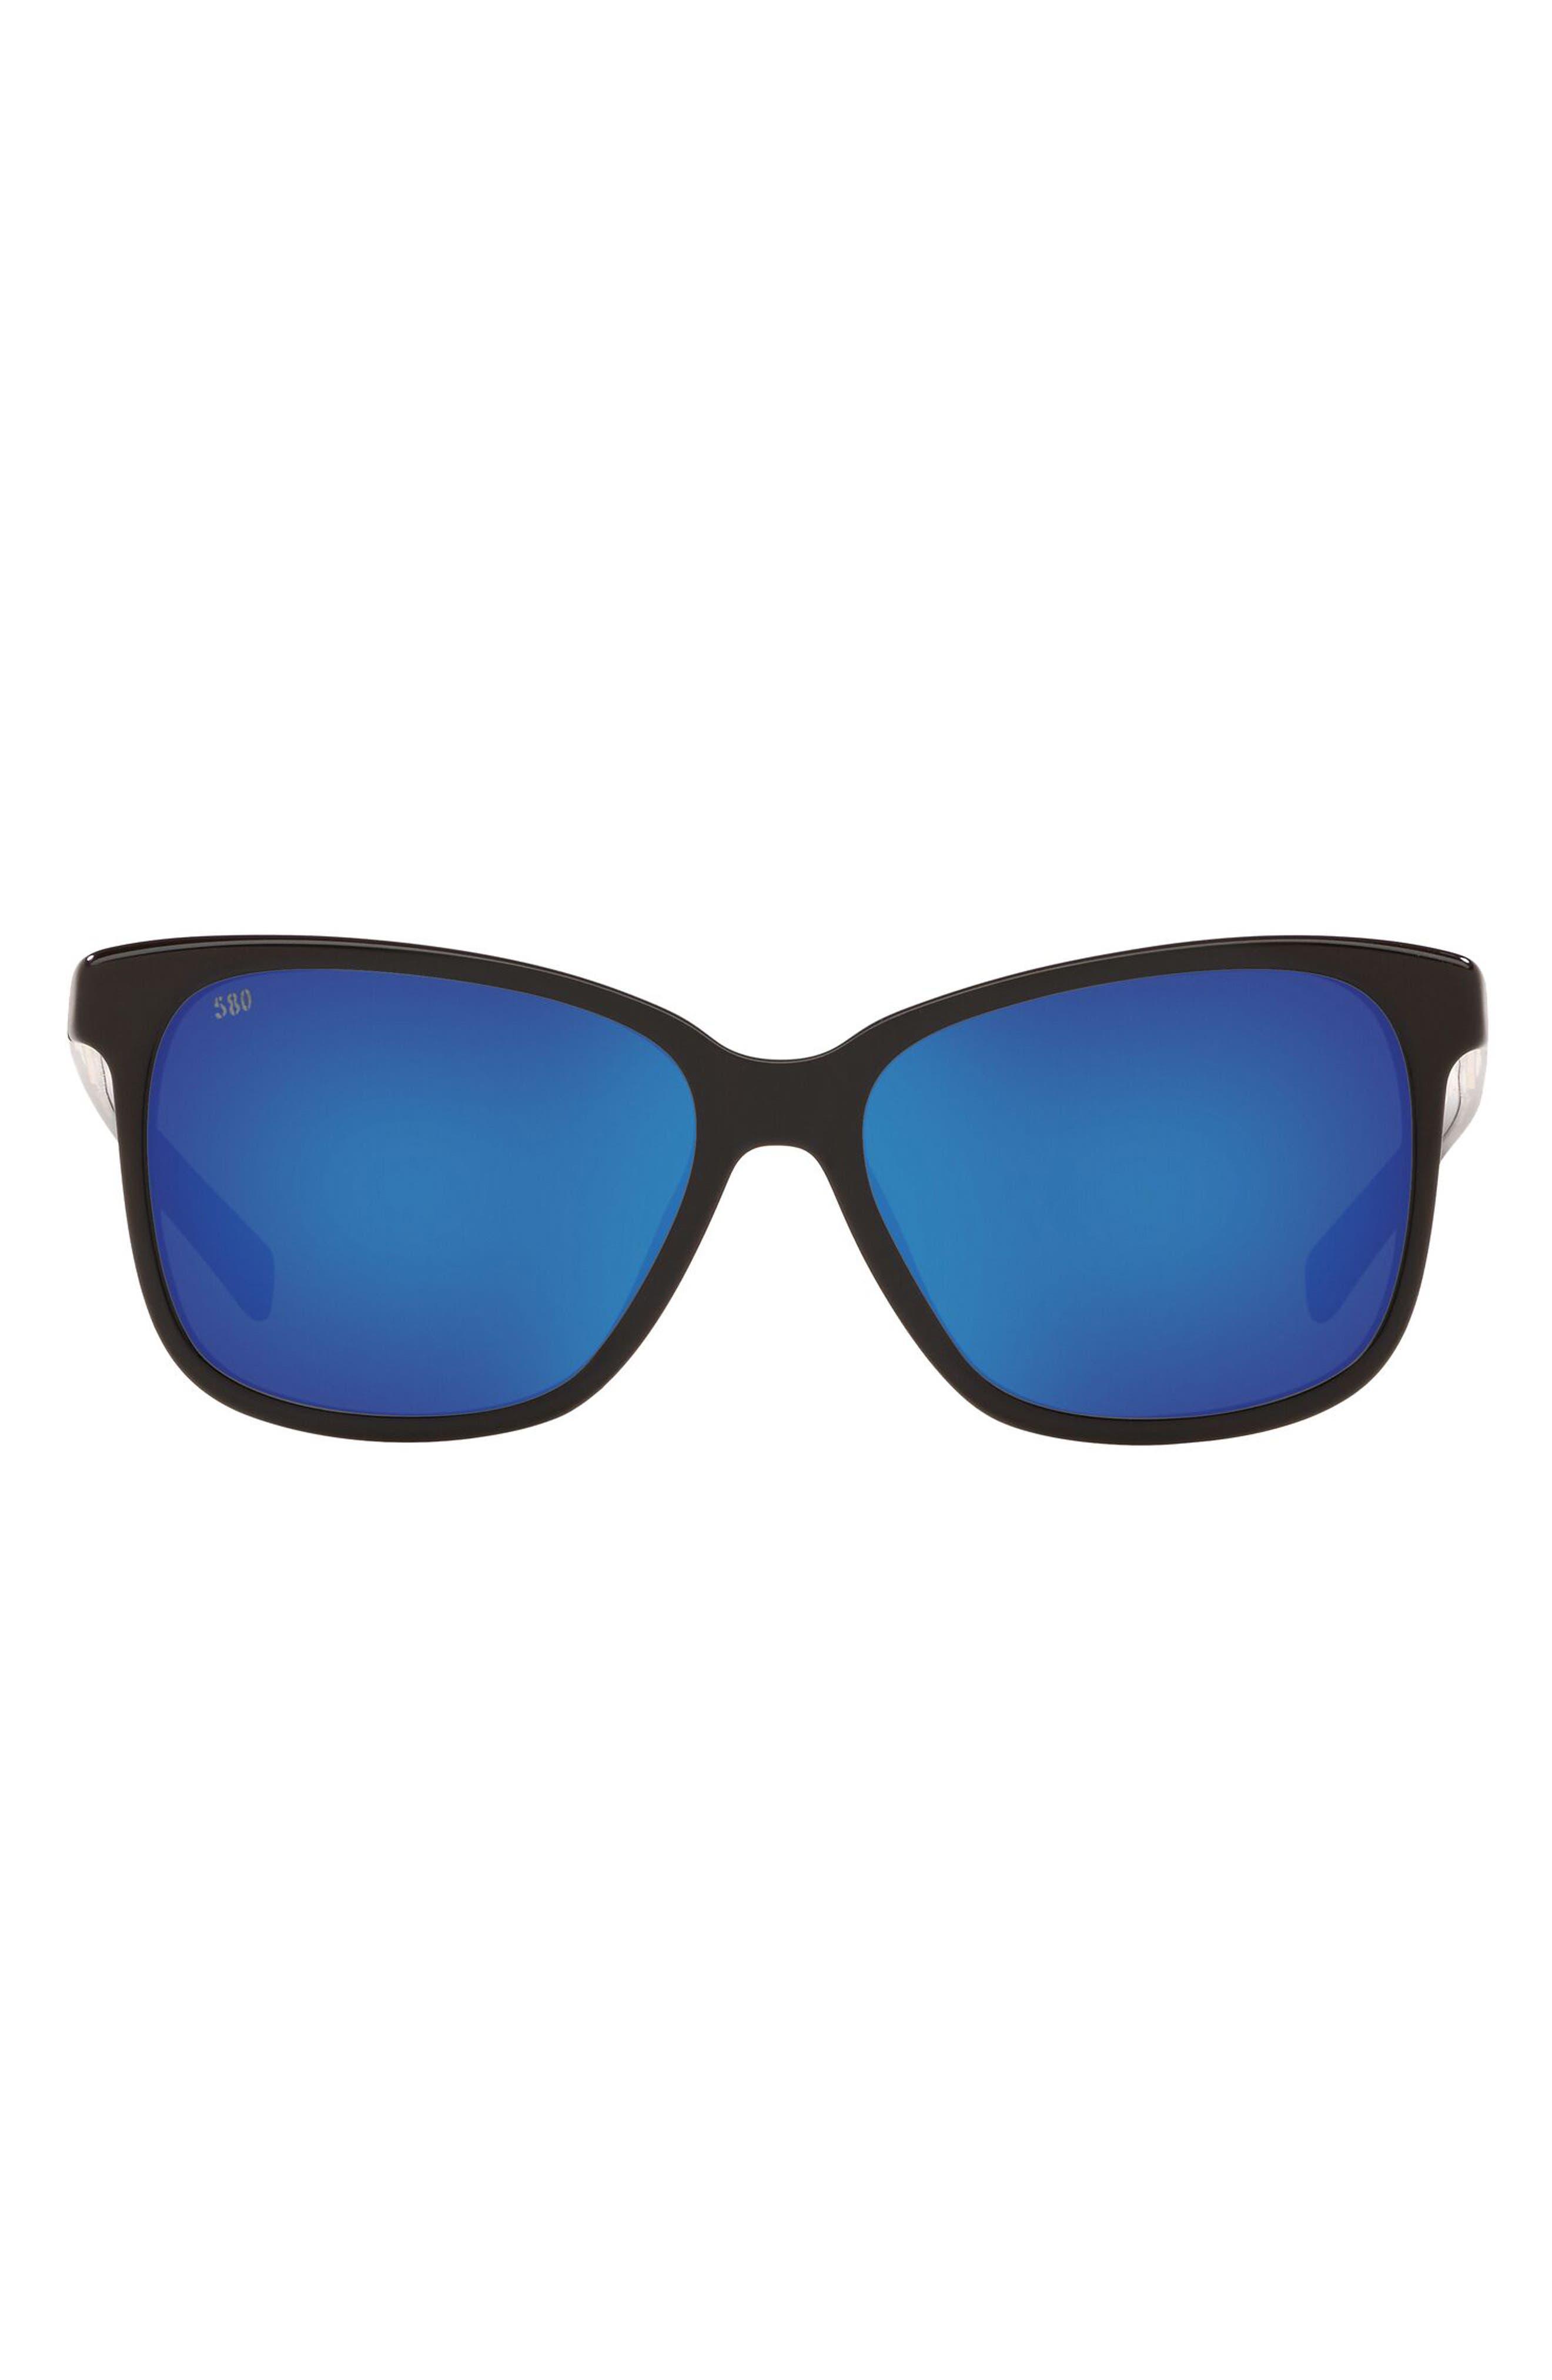 Phantos 57mm Polarized Sunglasses